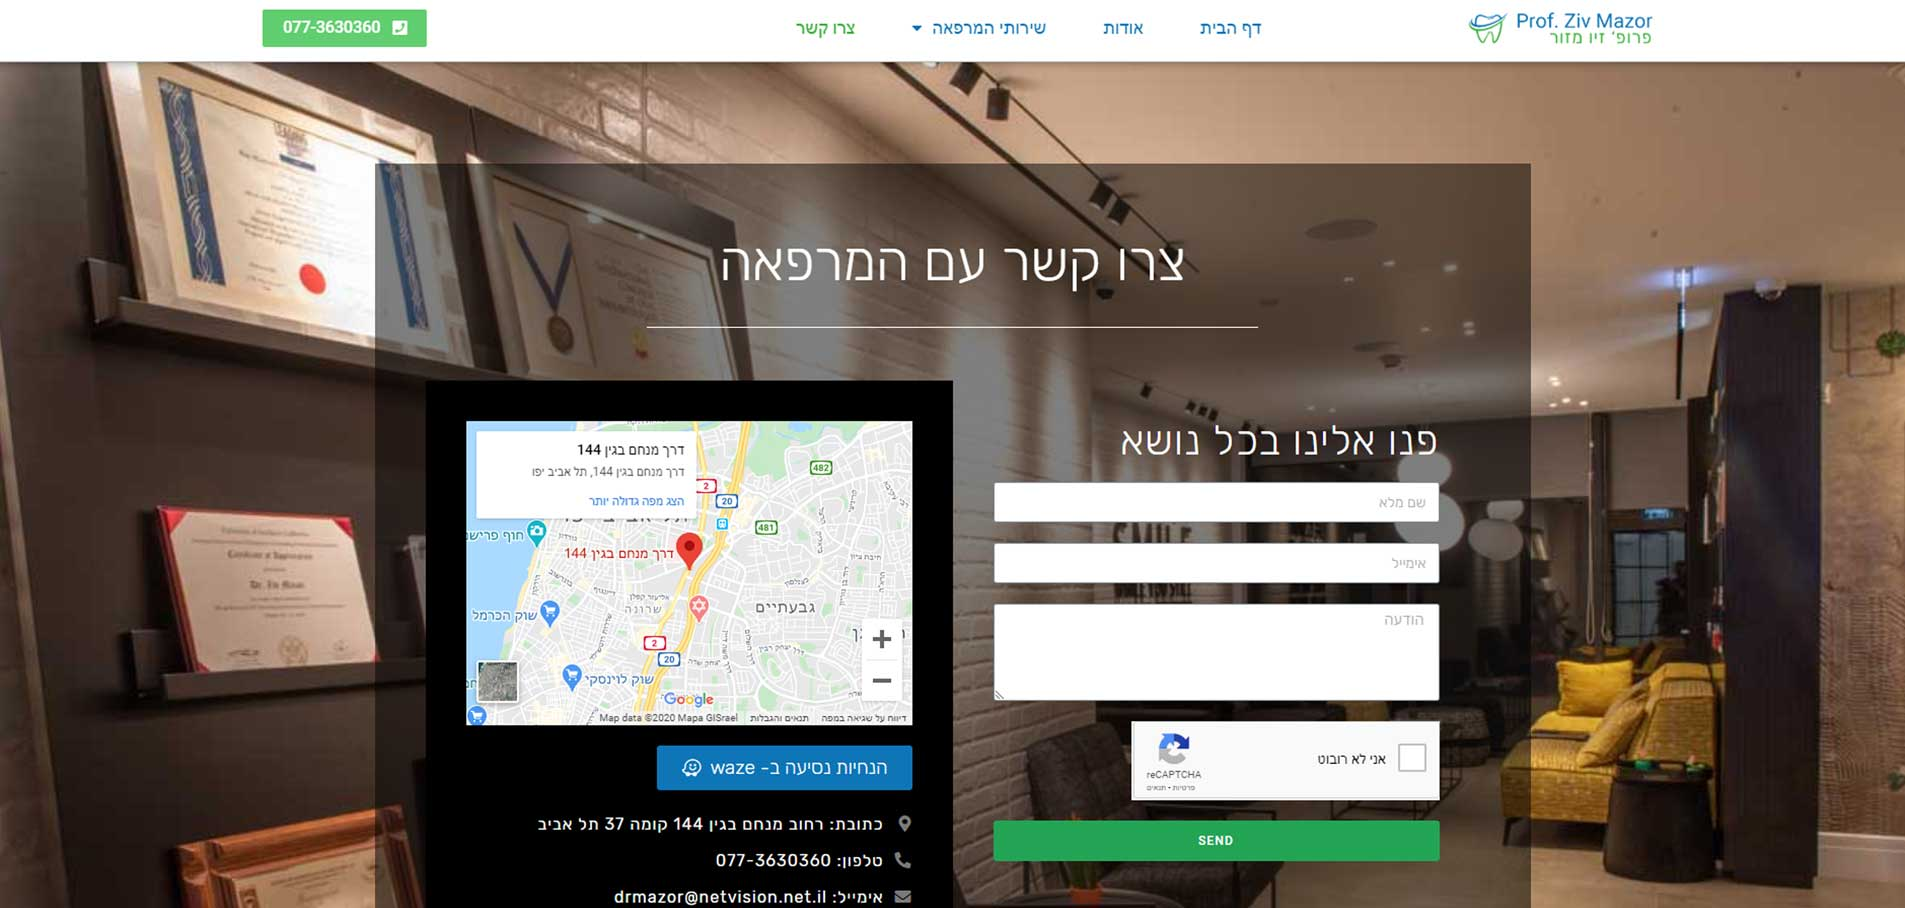 Ziv Mazor website G